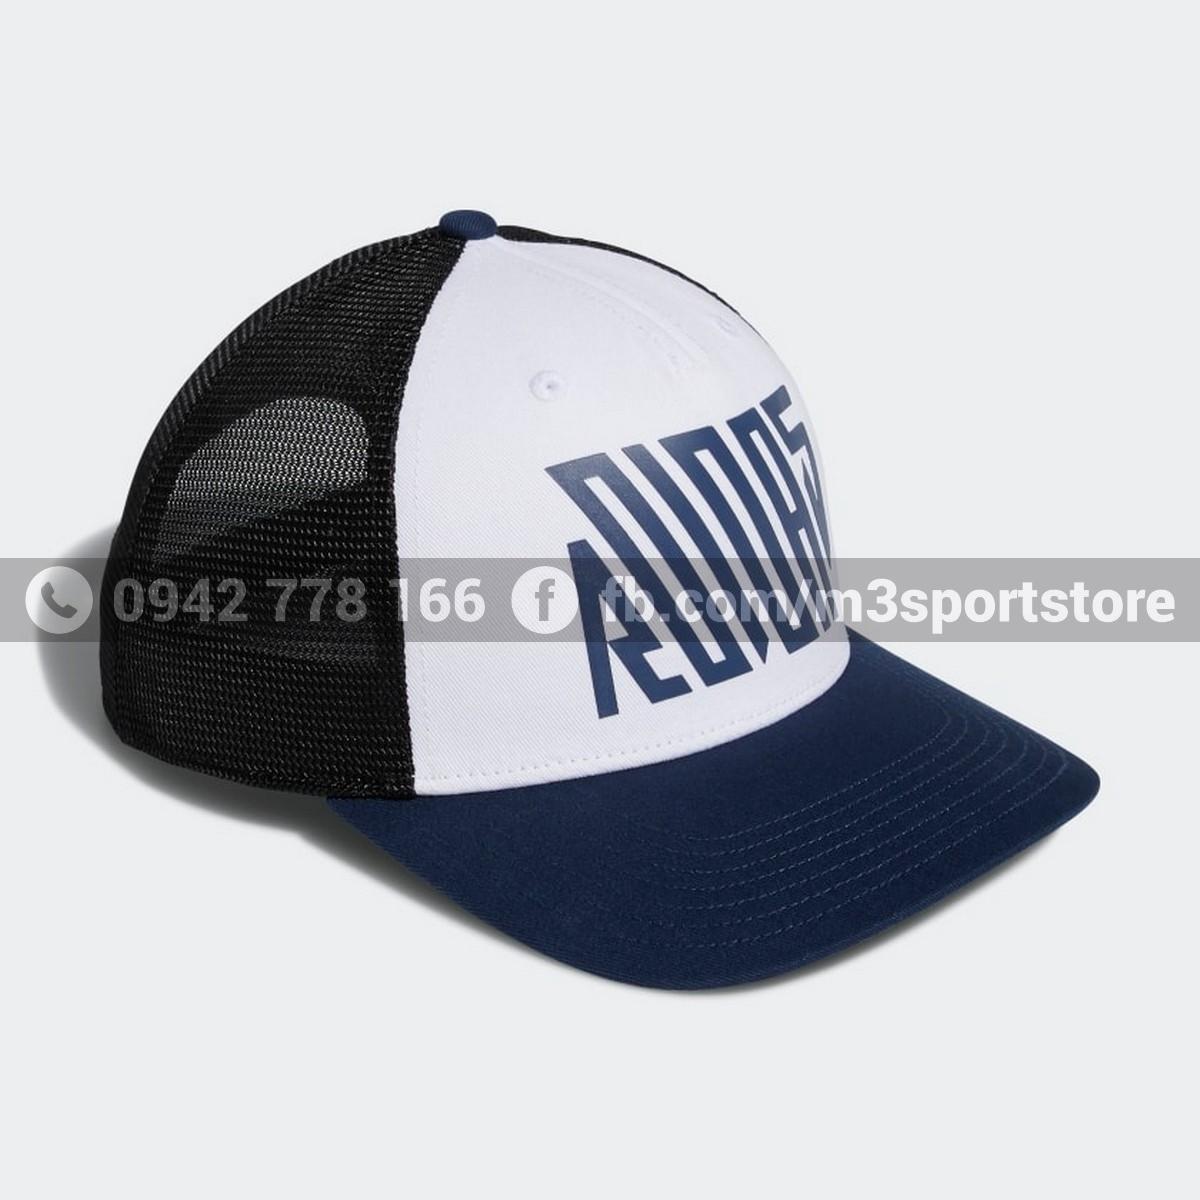 Mũ thể thao Adidas Trucker Hat GJ8172